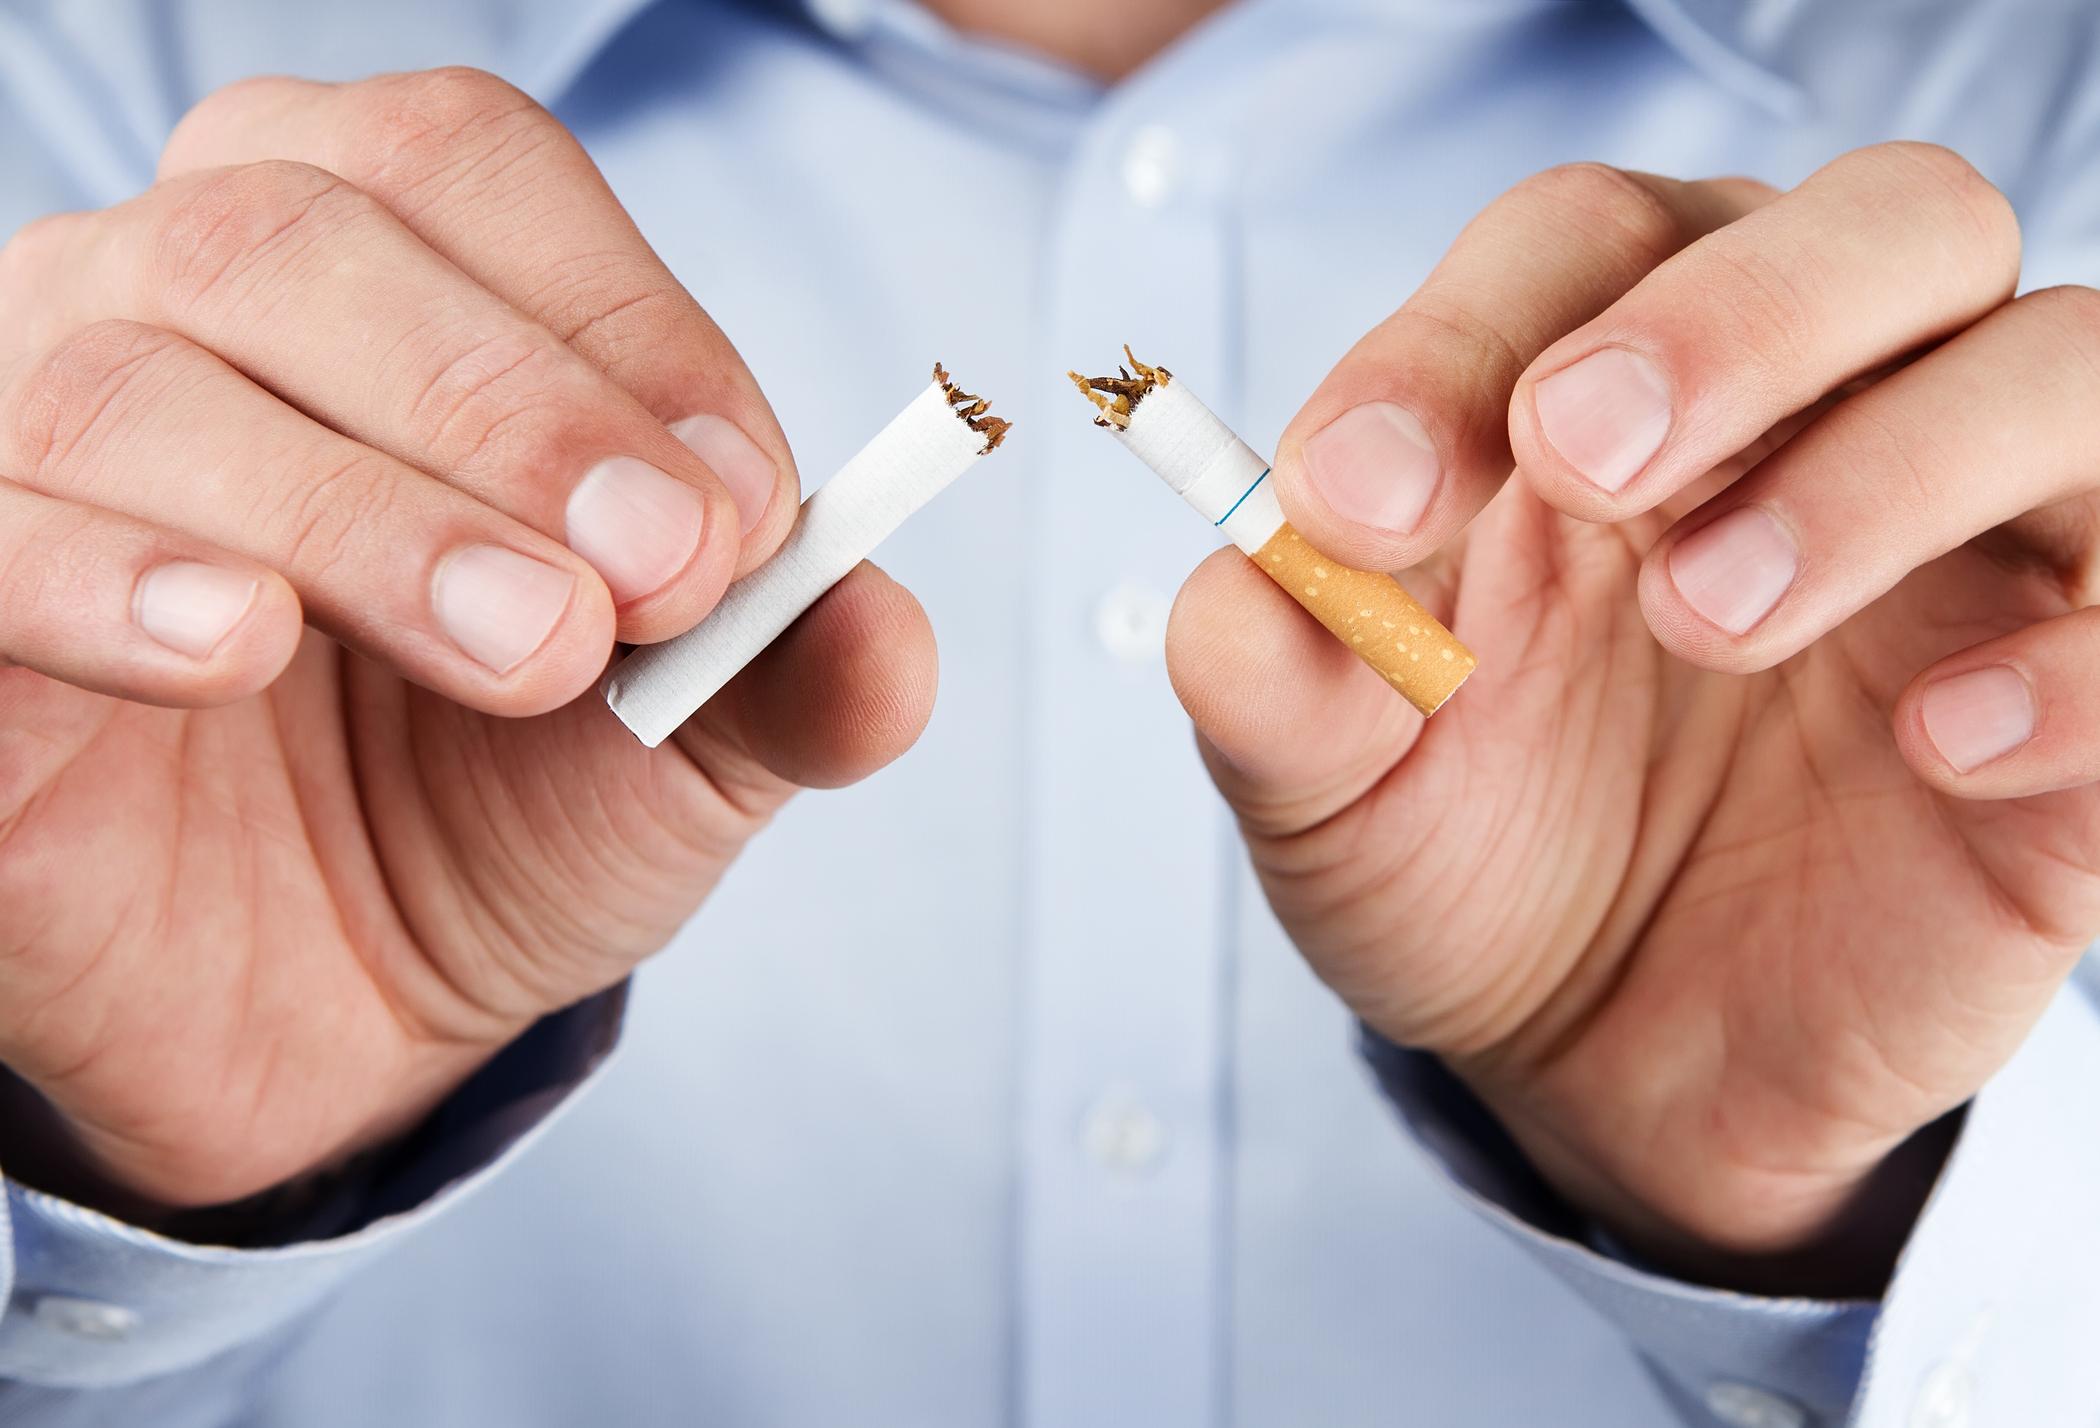 Hands breaking a cigarette